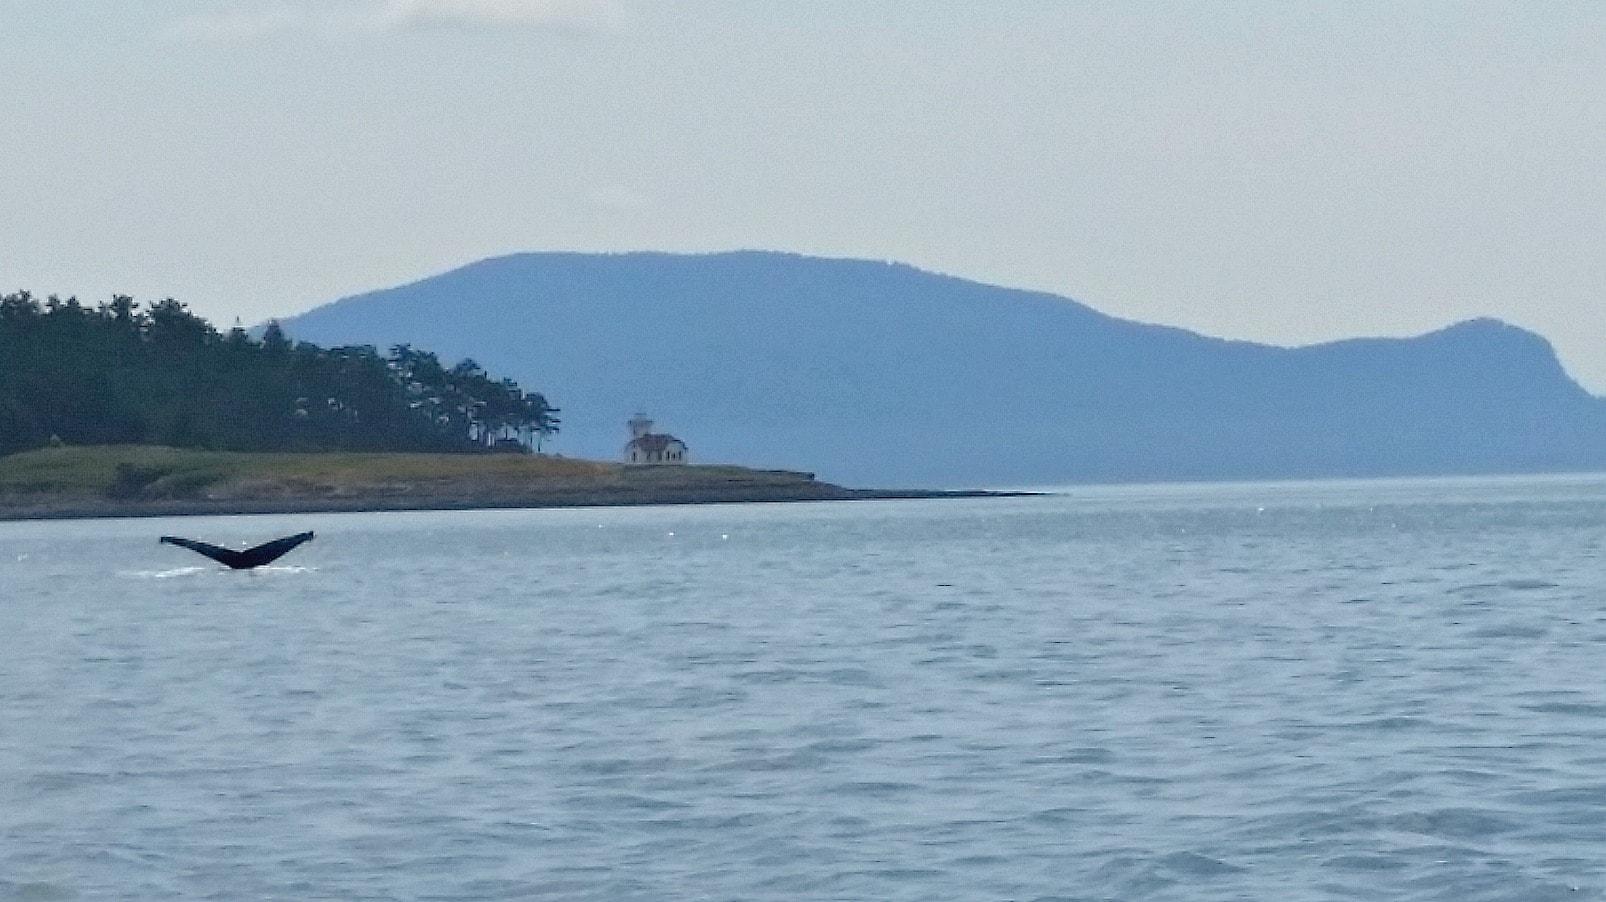 Whale Watching in San Juans Islands